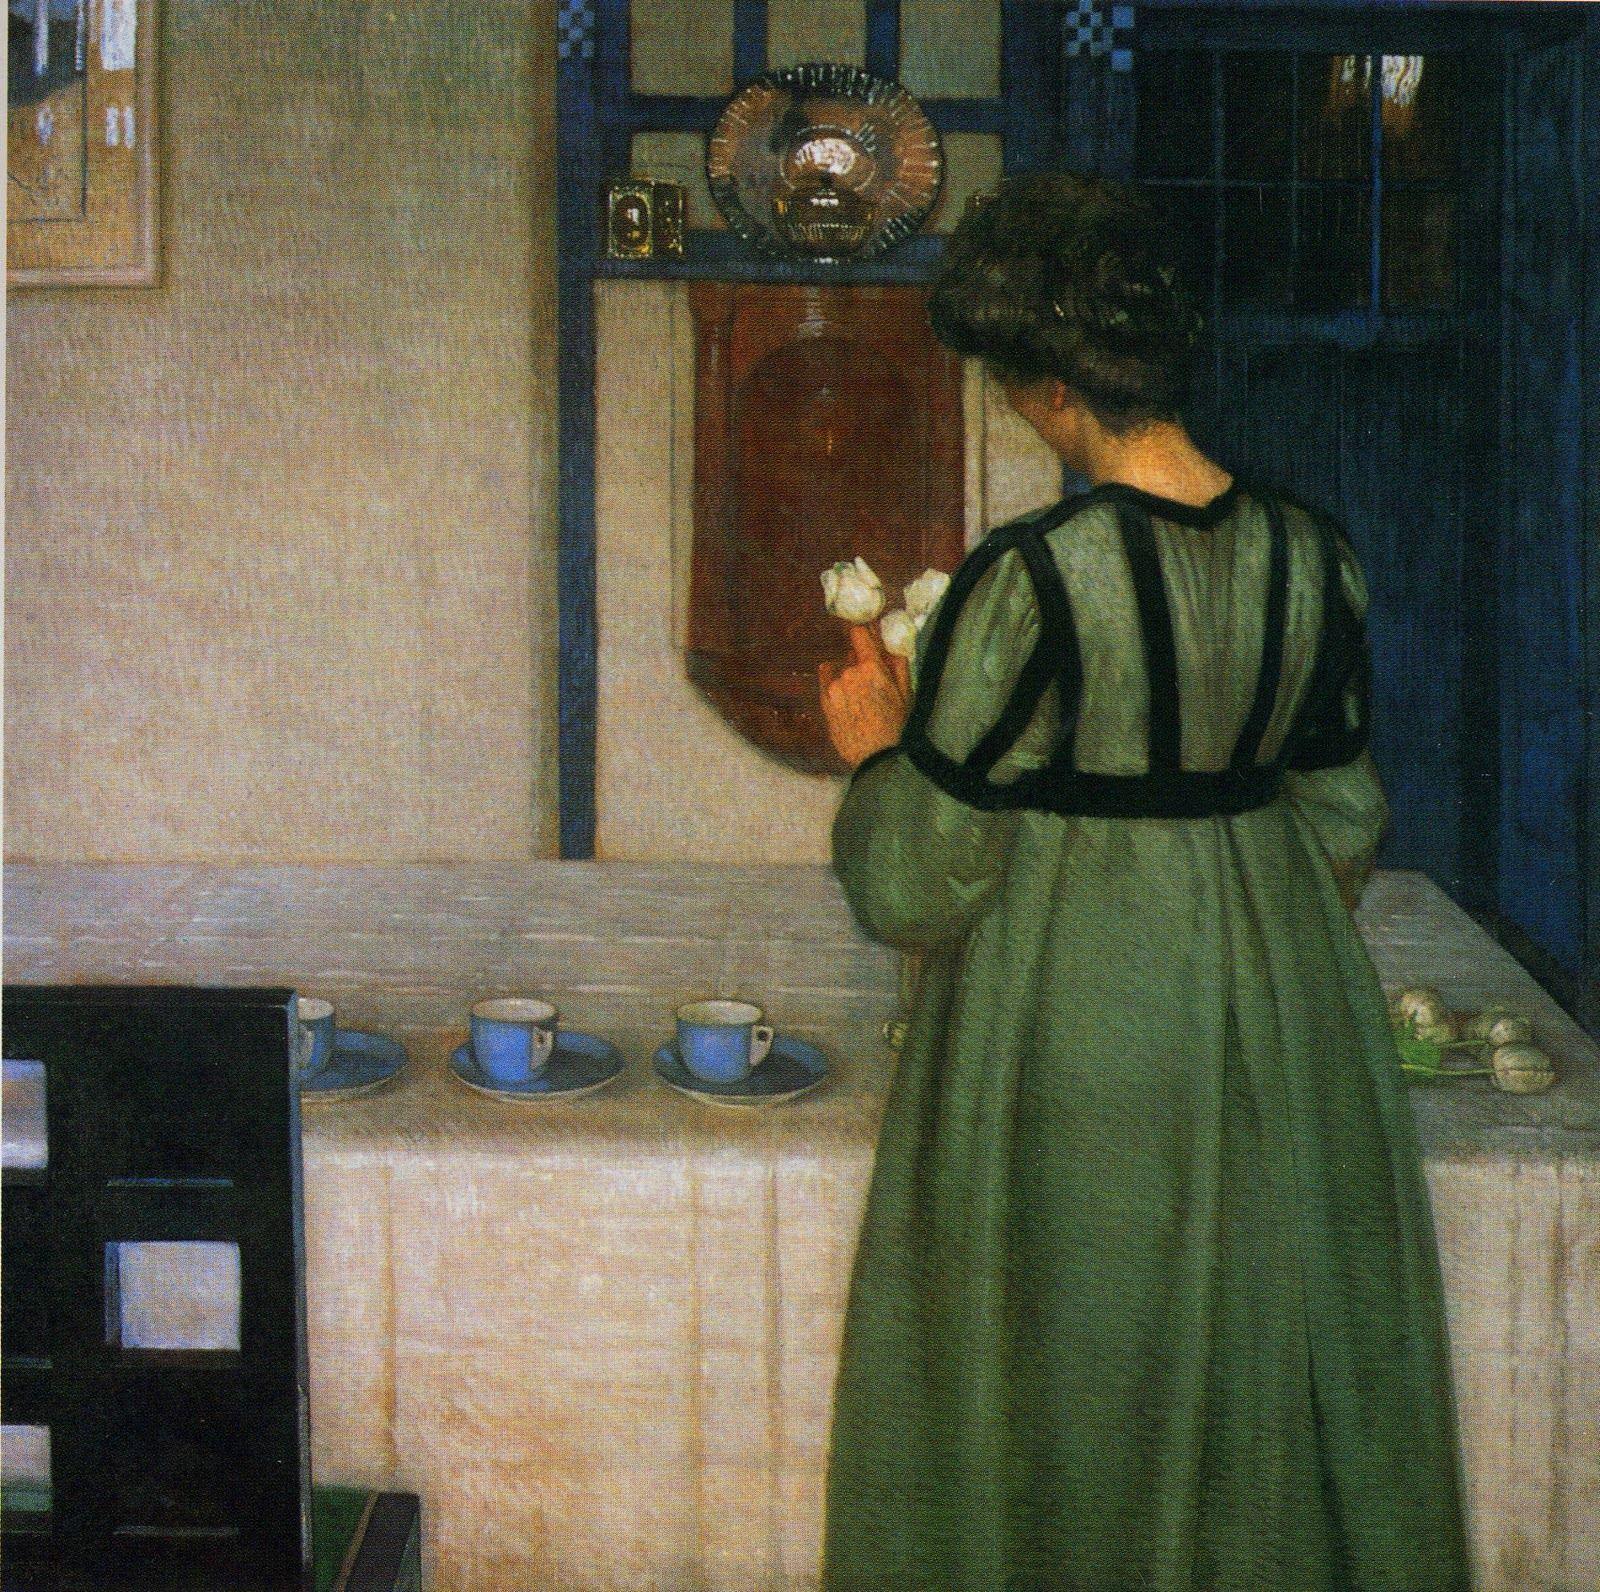 At The Sideboard, 1903 by Carl Moll (Austrian 1861-1945) | Art, Art  history, Interior art